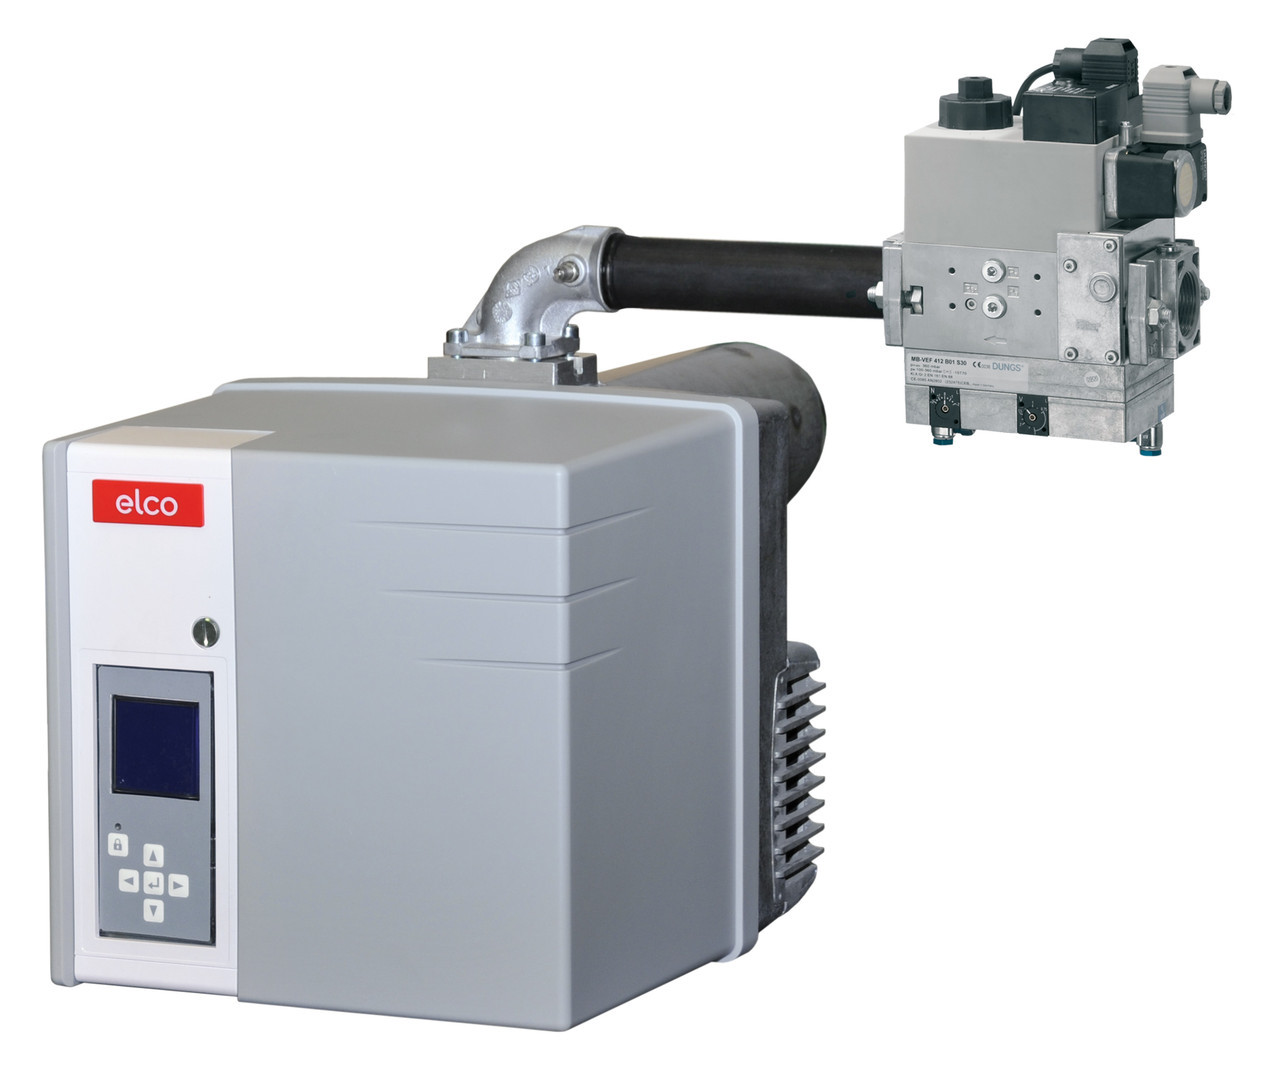 "Двухтопливная горелка ELCO VECTRON vgl 2.120 kl, до 120 кВт, (дизель/газ + газовая рампа d 3/4"")"